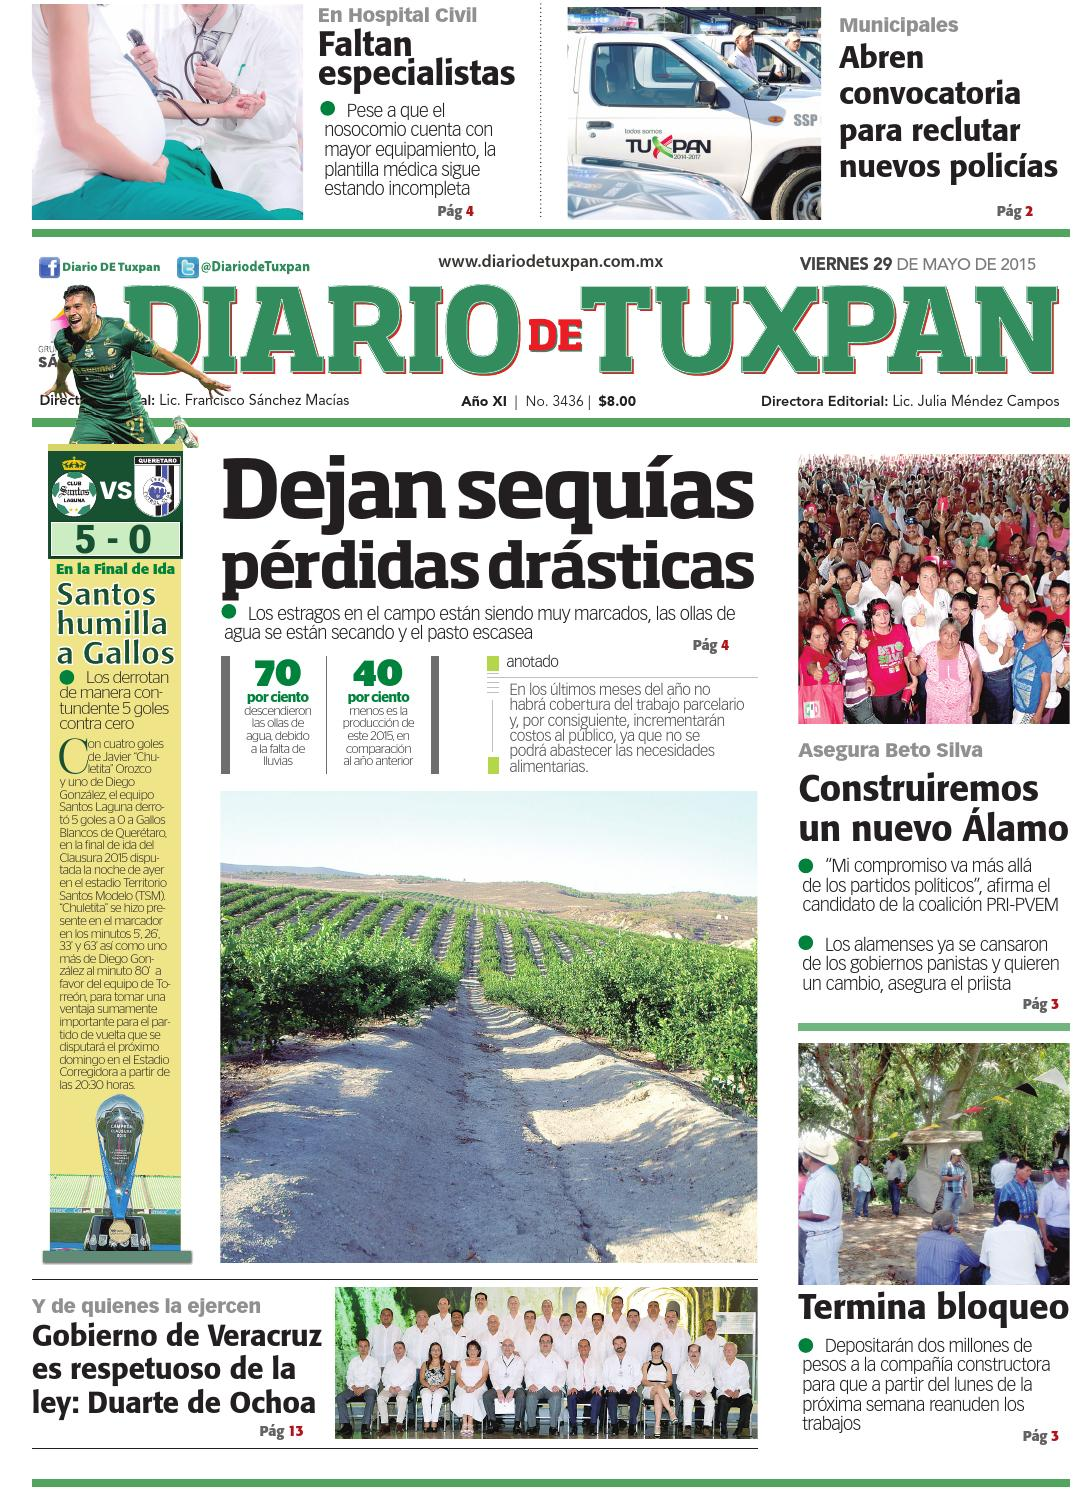 Diario de Tuxpan 29 de Mayo de 2015 by DIARIO DE TUXPAN - issuu